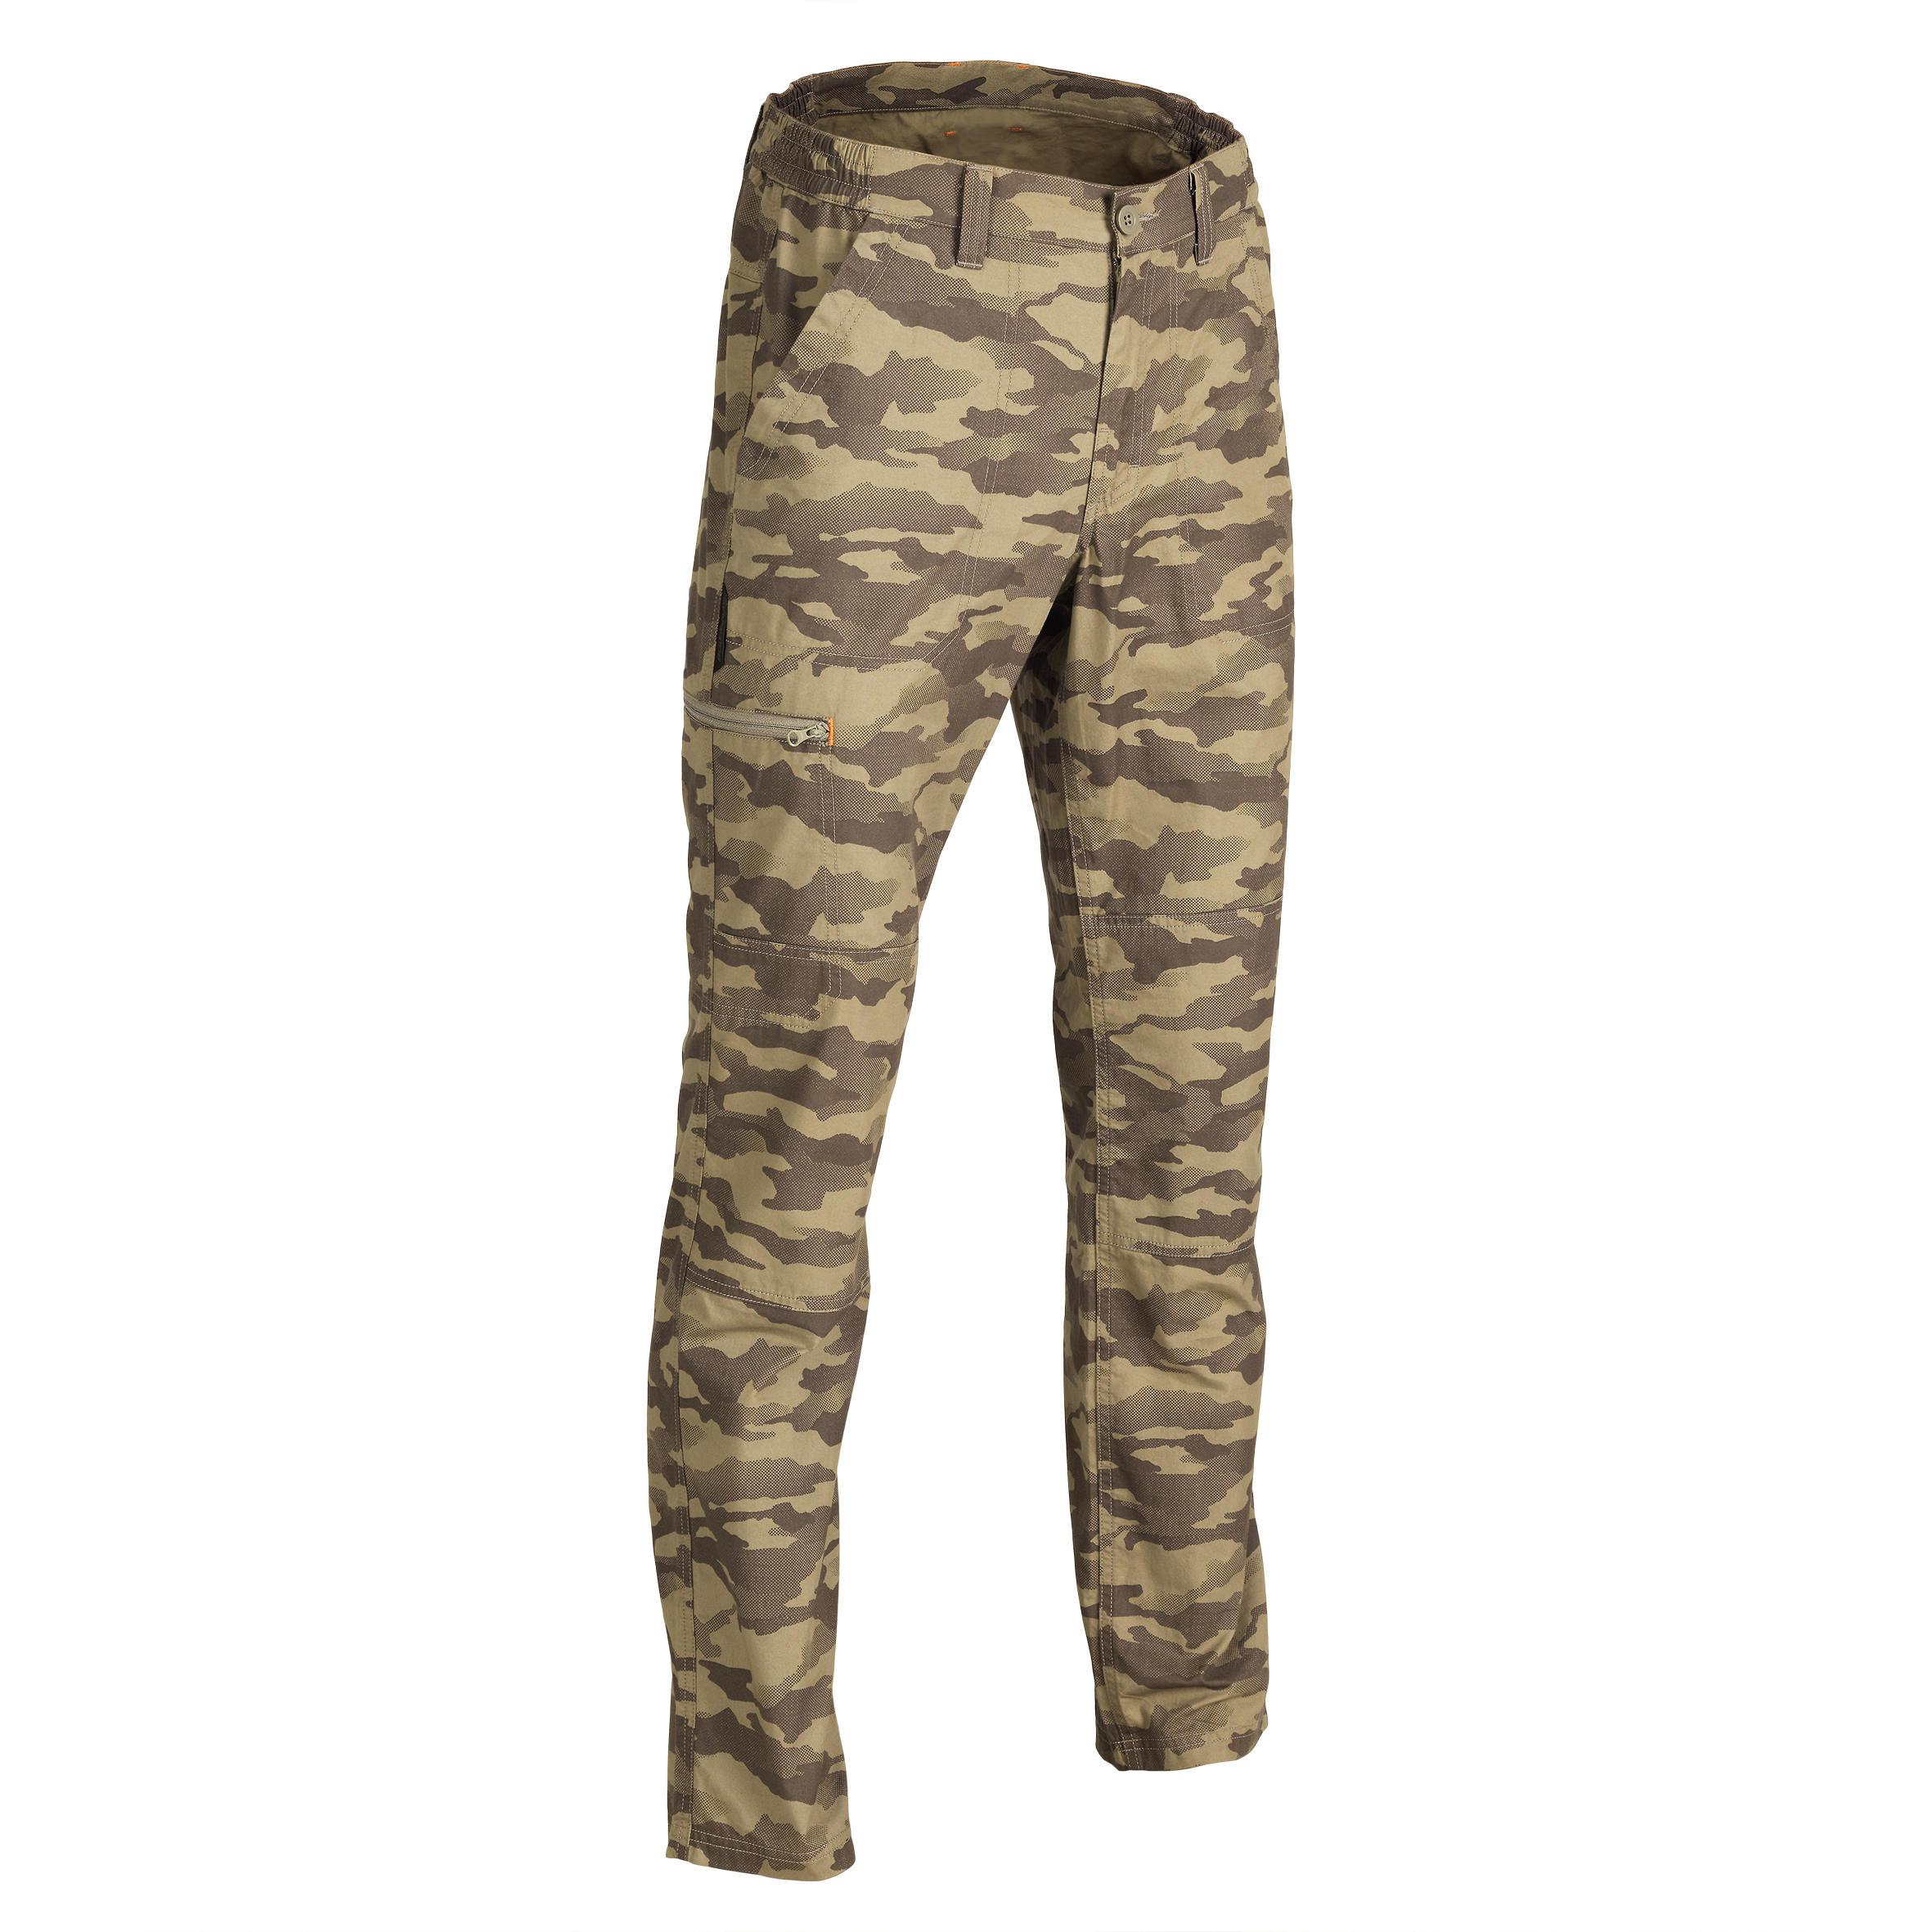 Jagdhose leicht 100 Camouflage grün   Sportbekleidung > Sporthosen > Trekkinghosen   Solognac